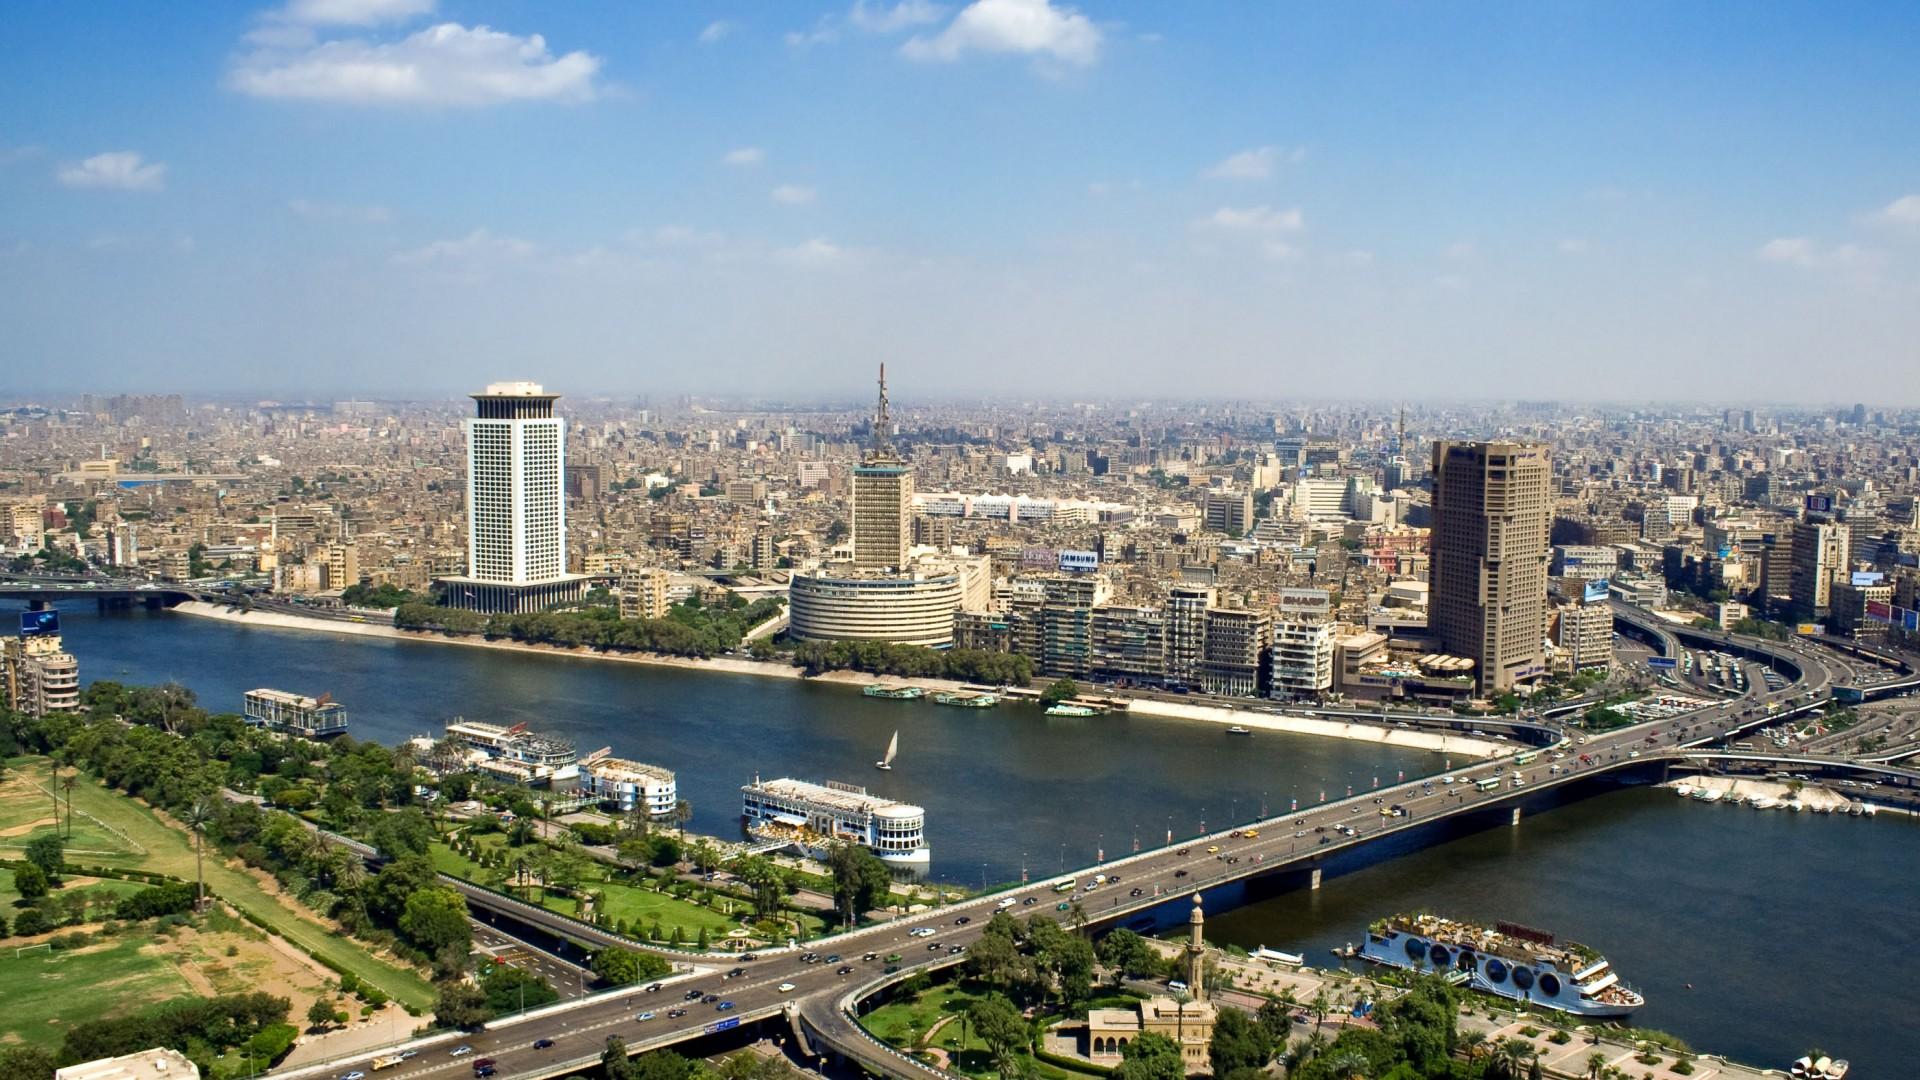 Cairo TraffiC CongesTion sTudy - World Bank